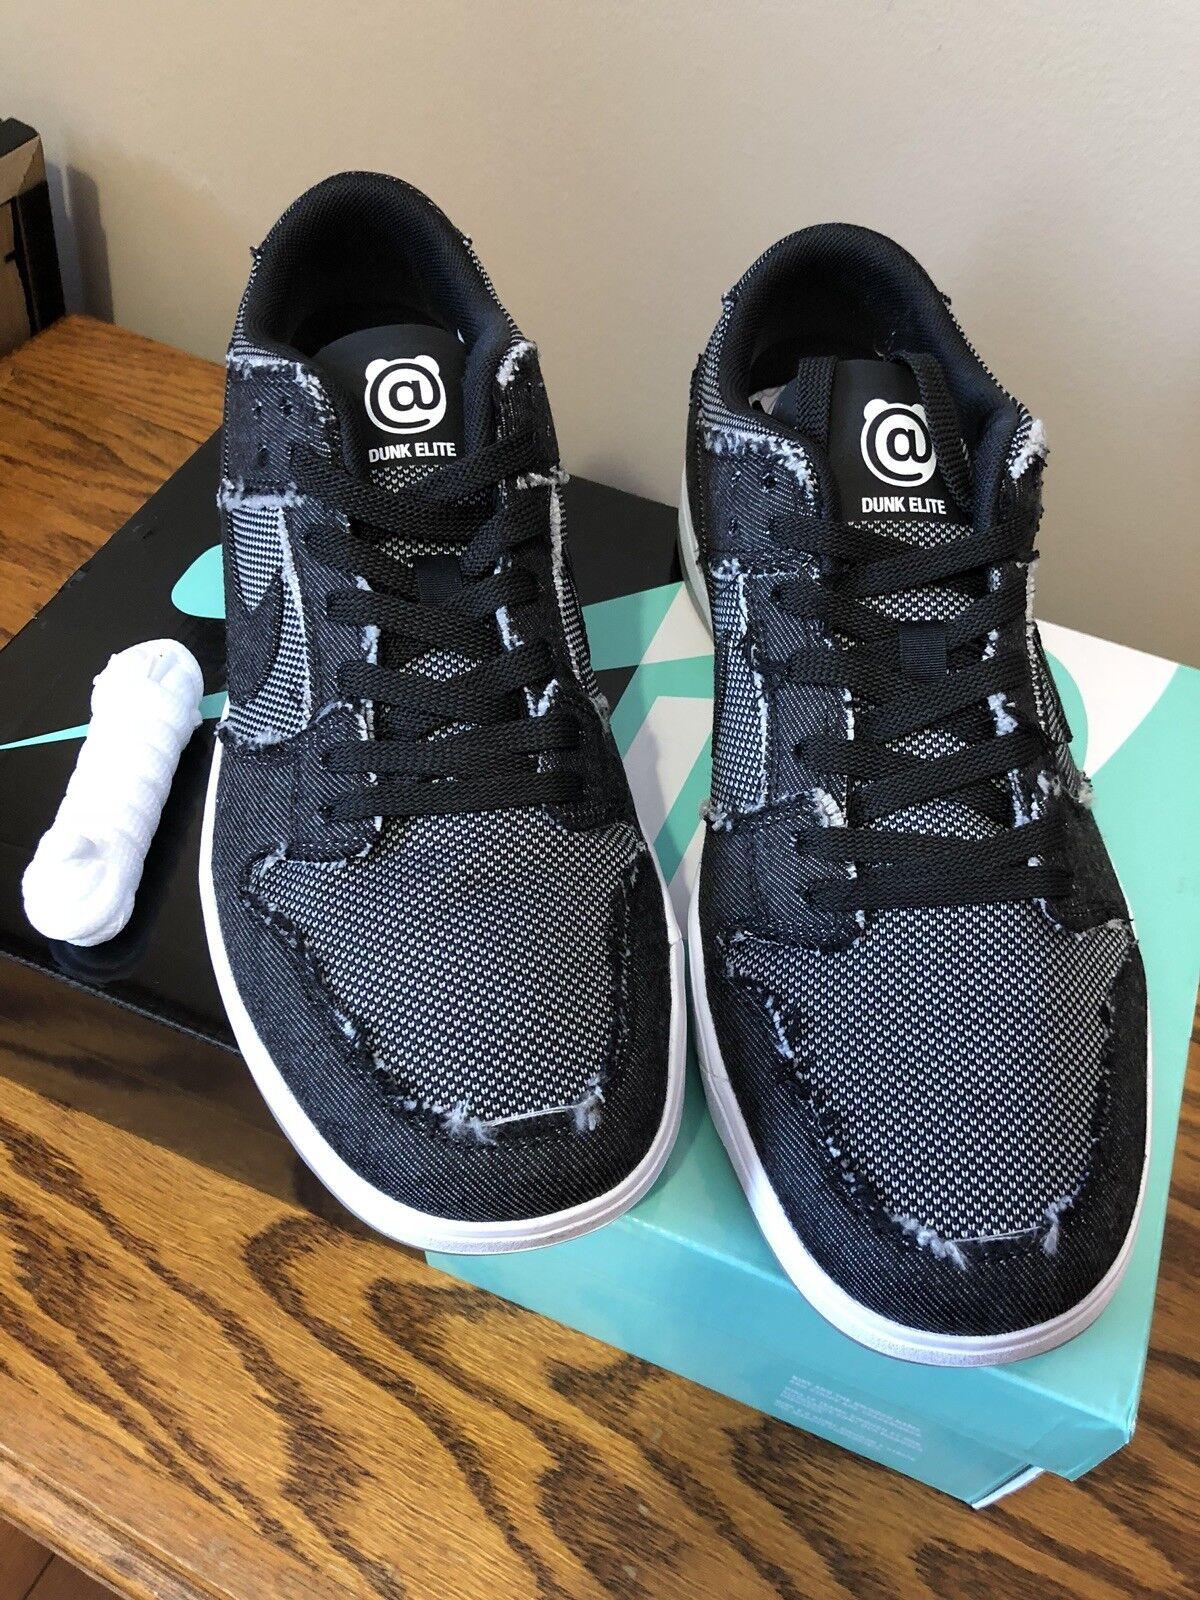 Nike Sb Zoom Dunk Low Elite QS X Size 10 Medicom Bearbrick Denim Be@rbrick